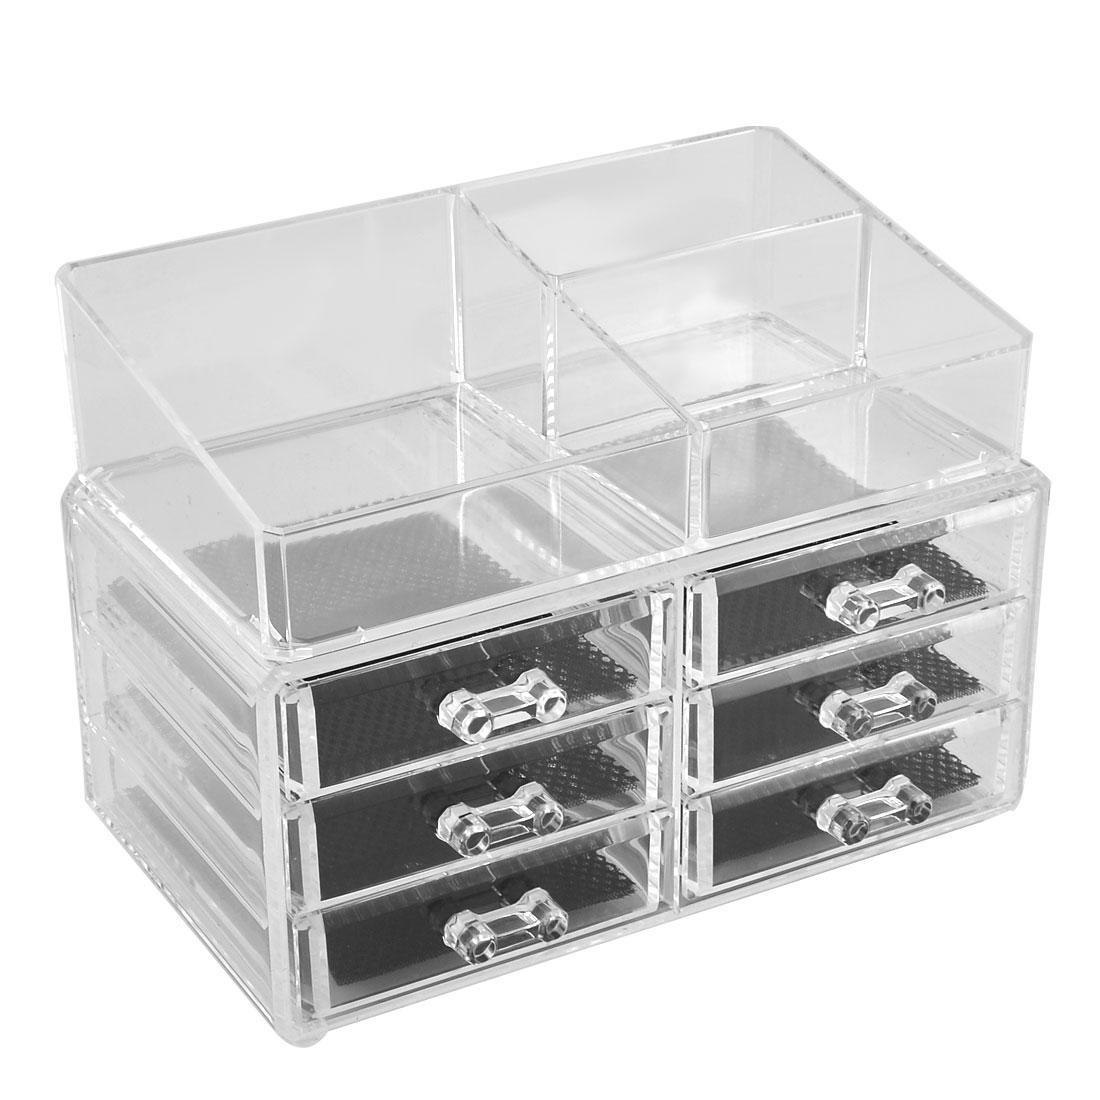 Woman Acrylic Cosmetics Makeup Organizer Case Jewelry Display Box 2 in 1